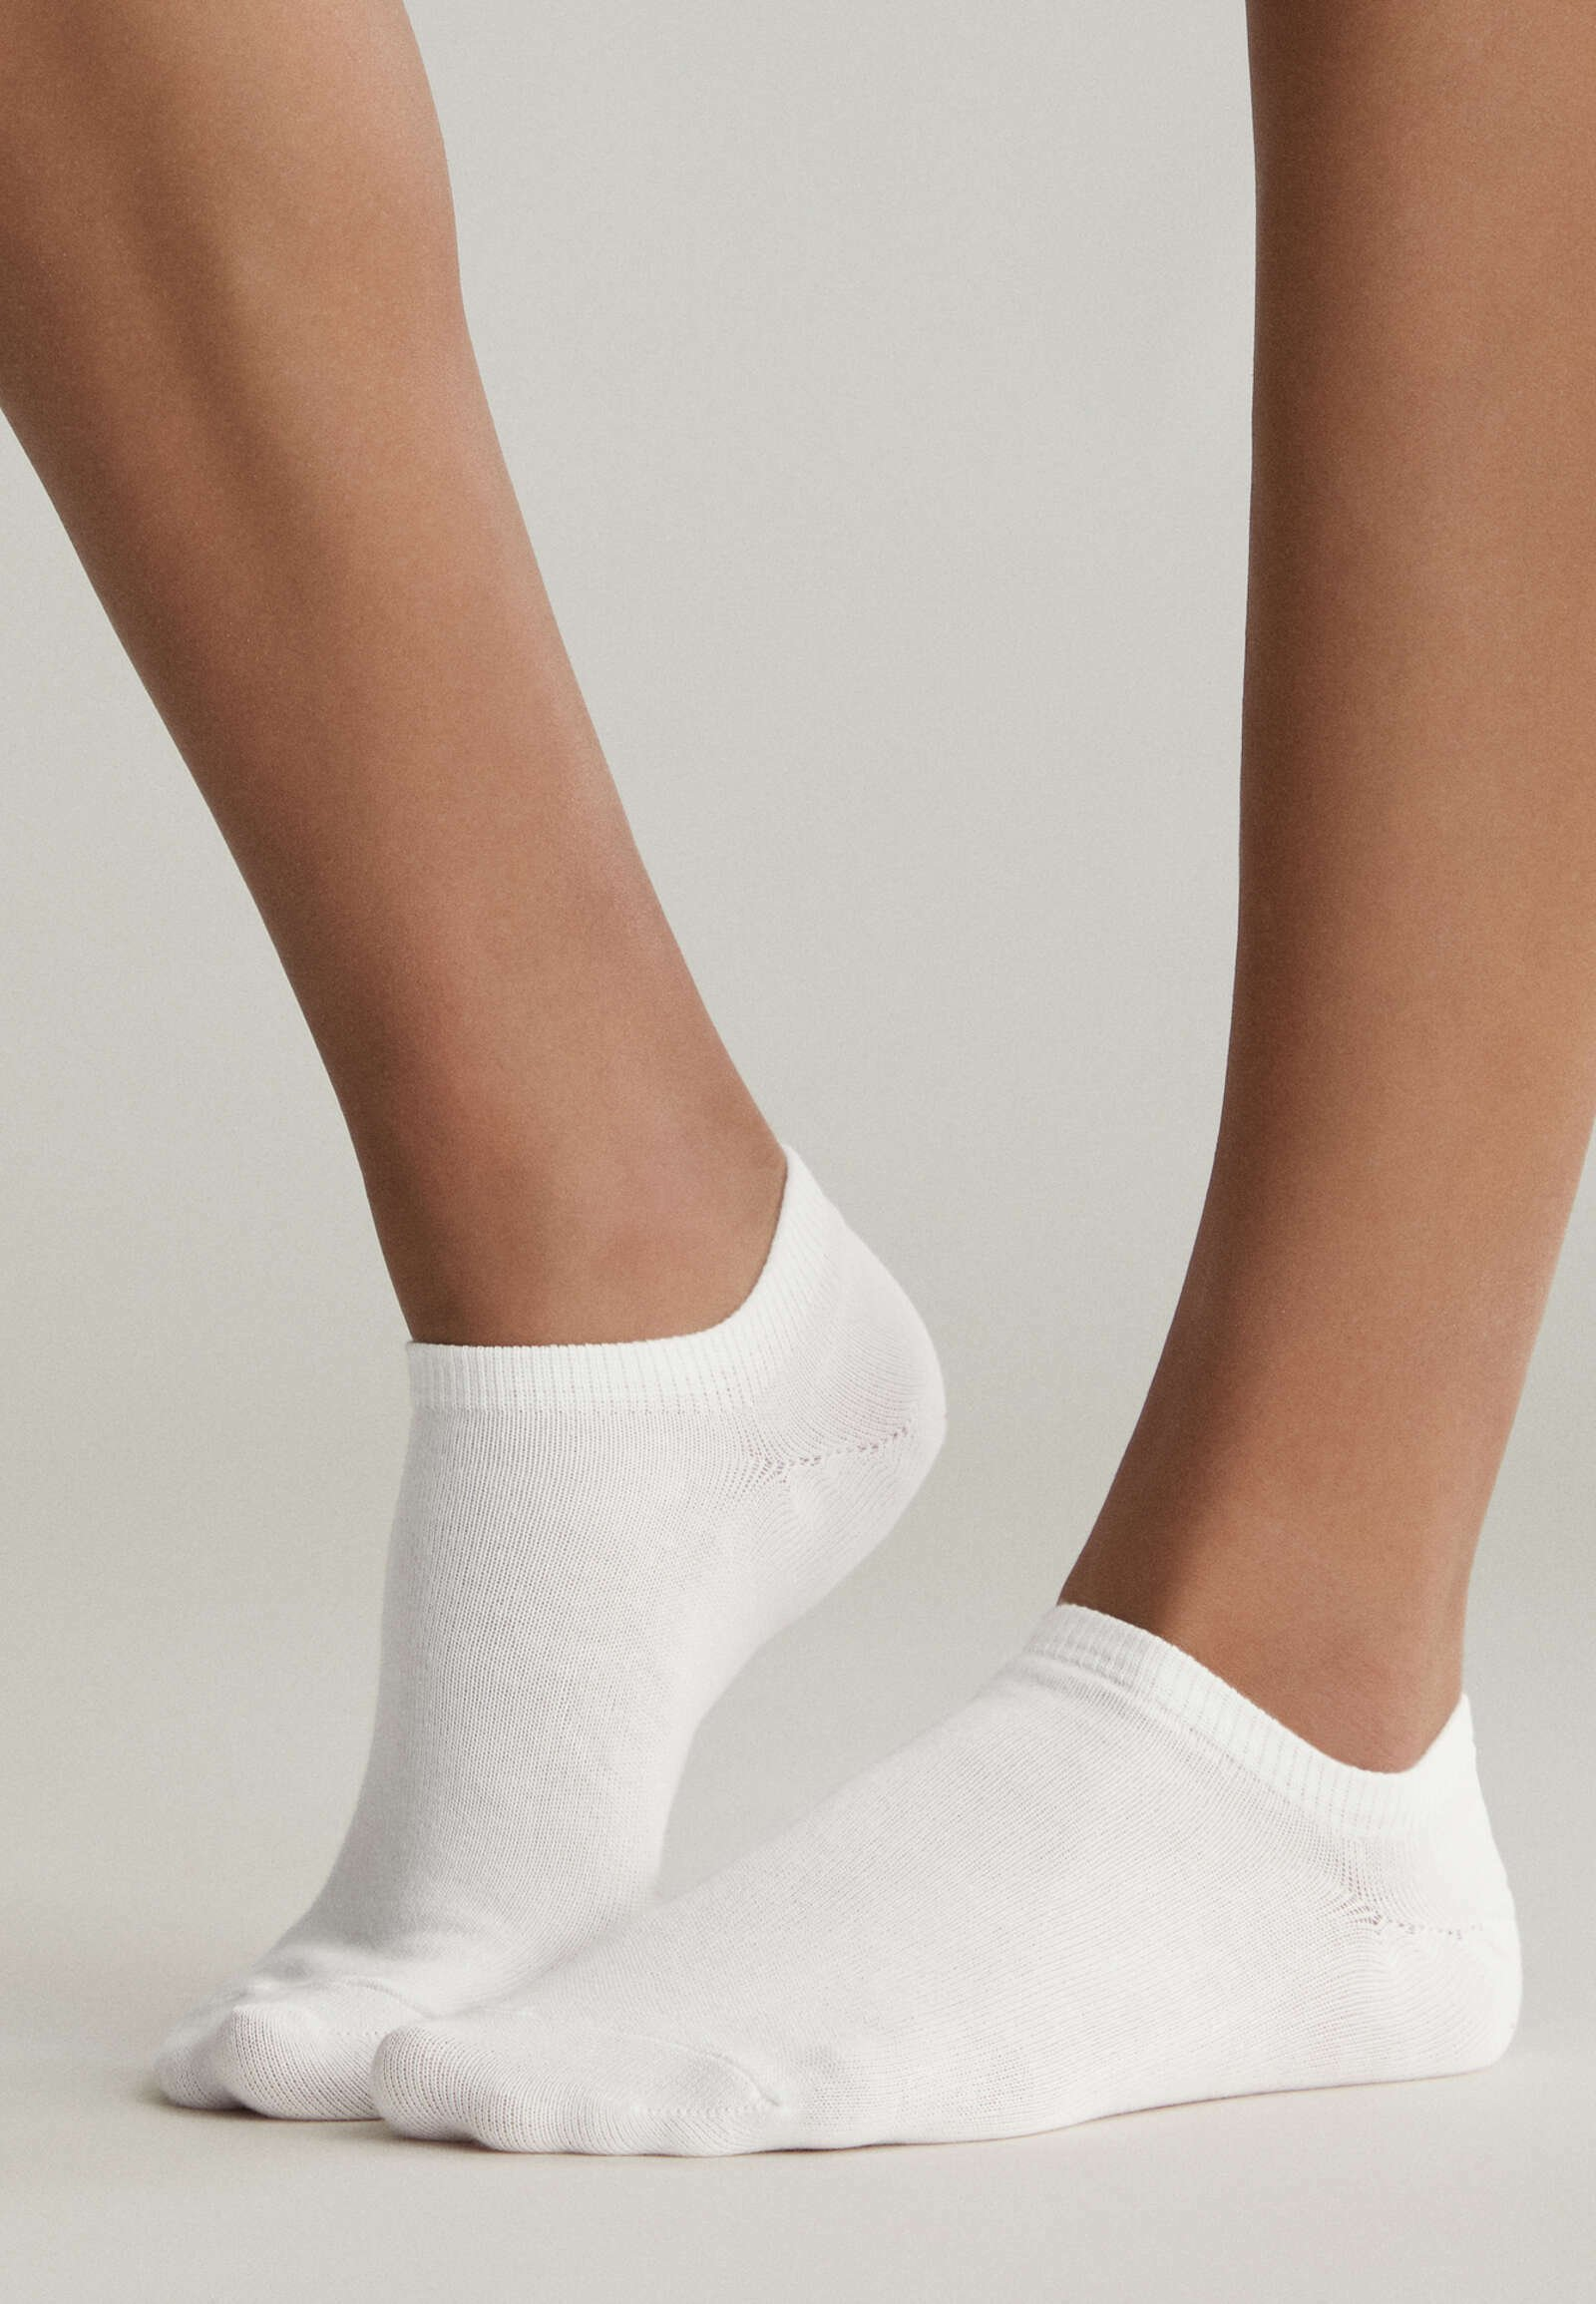 Femme 5 PACK - Socquettes